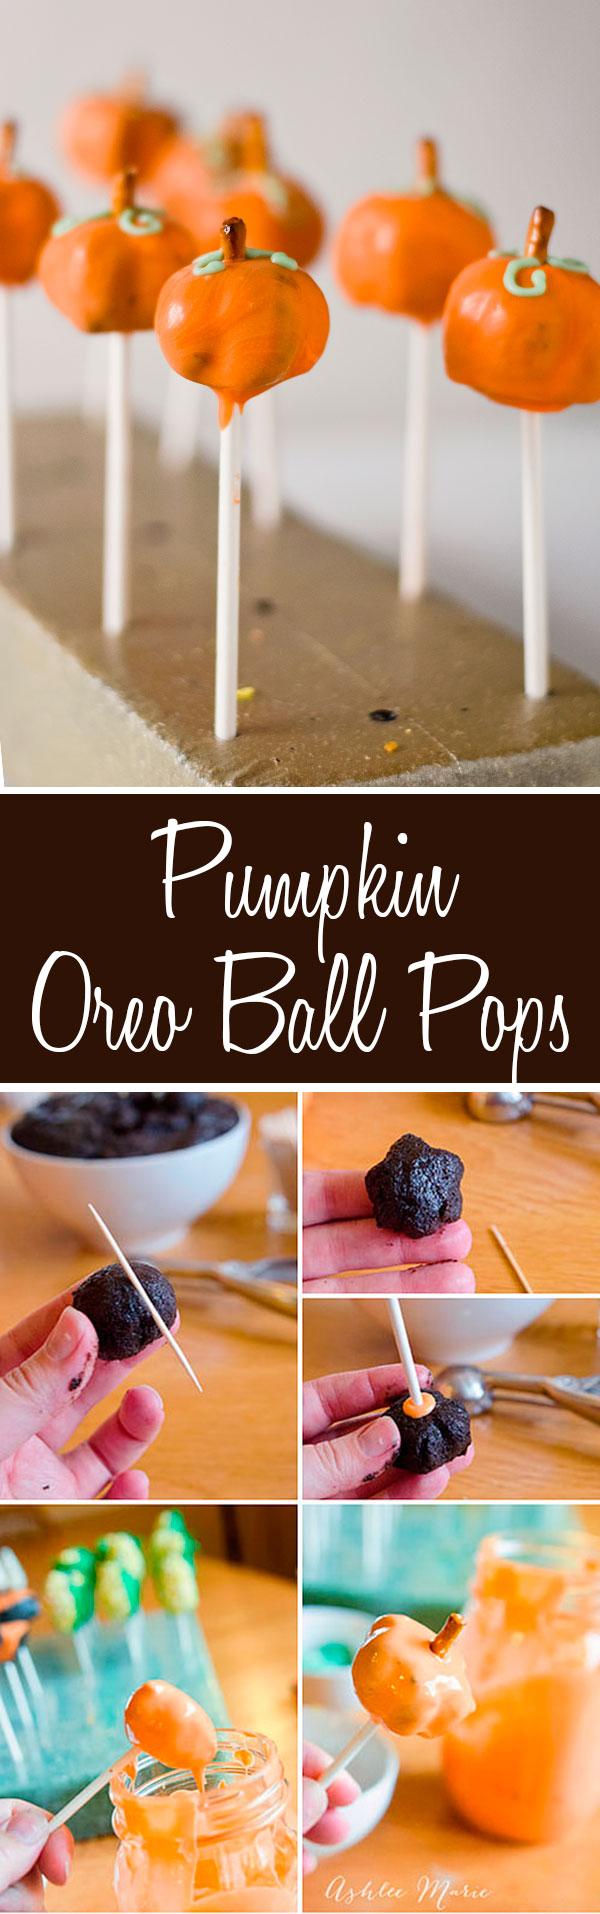 tutorial on how to create a pumpkin shaped OREO ball pop